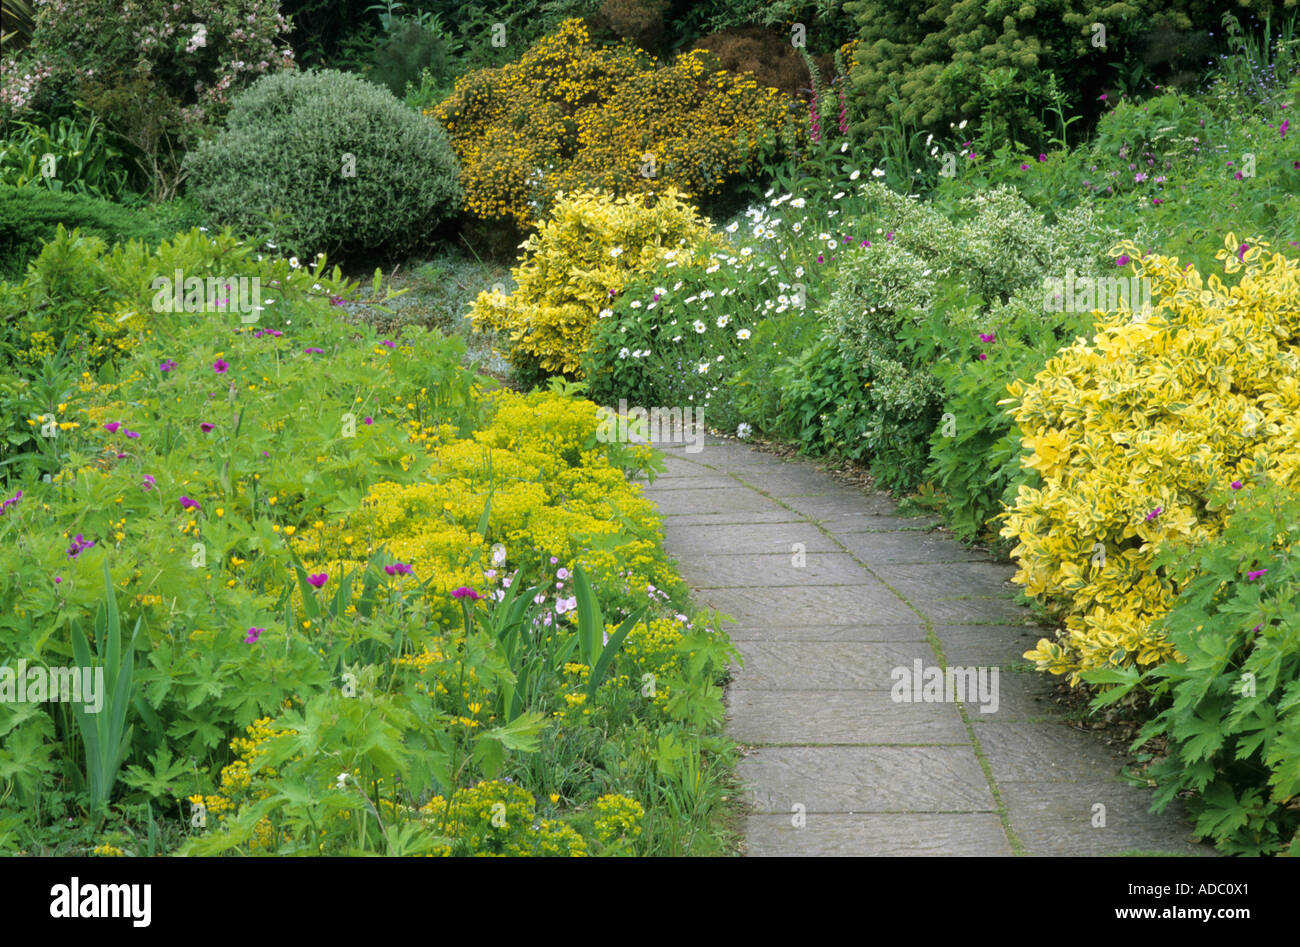 Garden Path yellow planting Euphorbia and Euonymus geranium